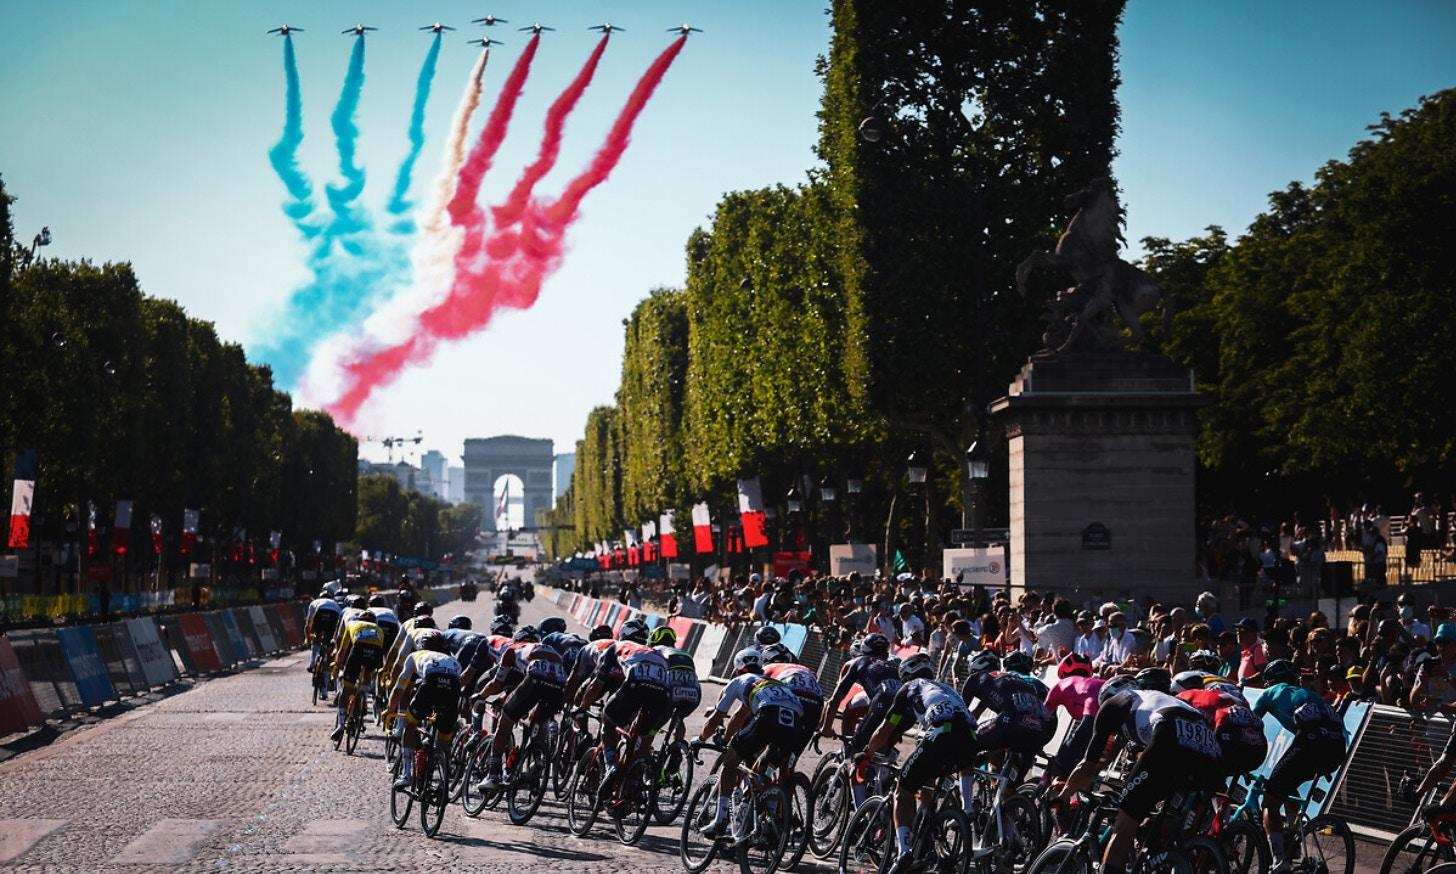 Tour de France 2021: samenvatting van de eenentwintigste etappe